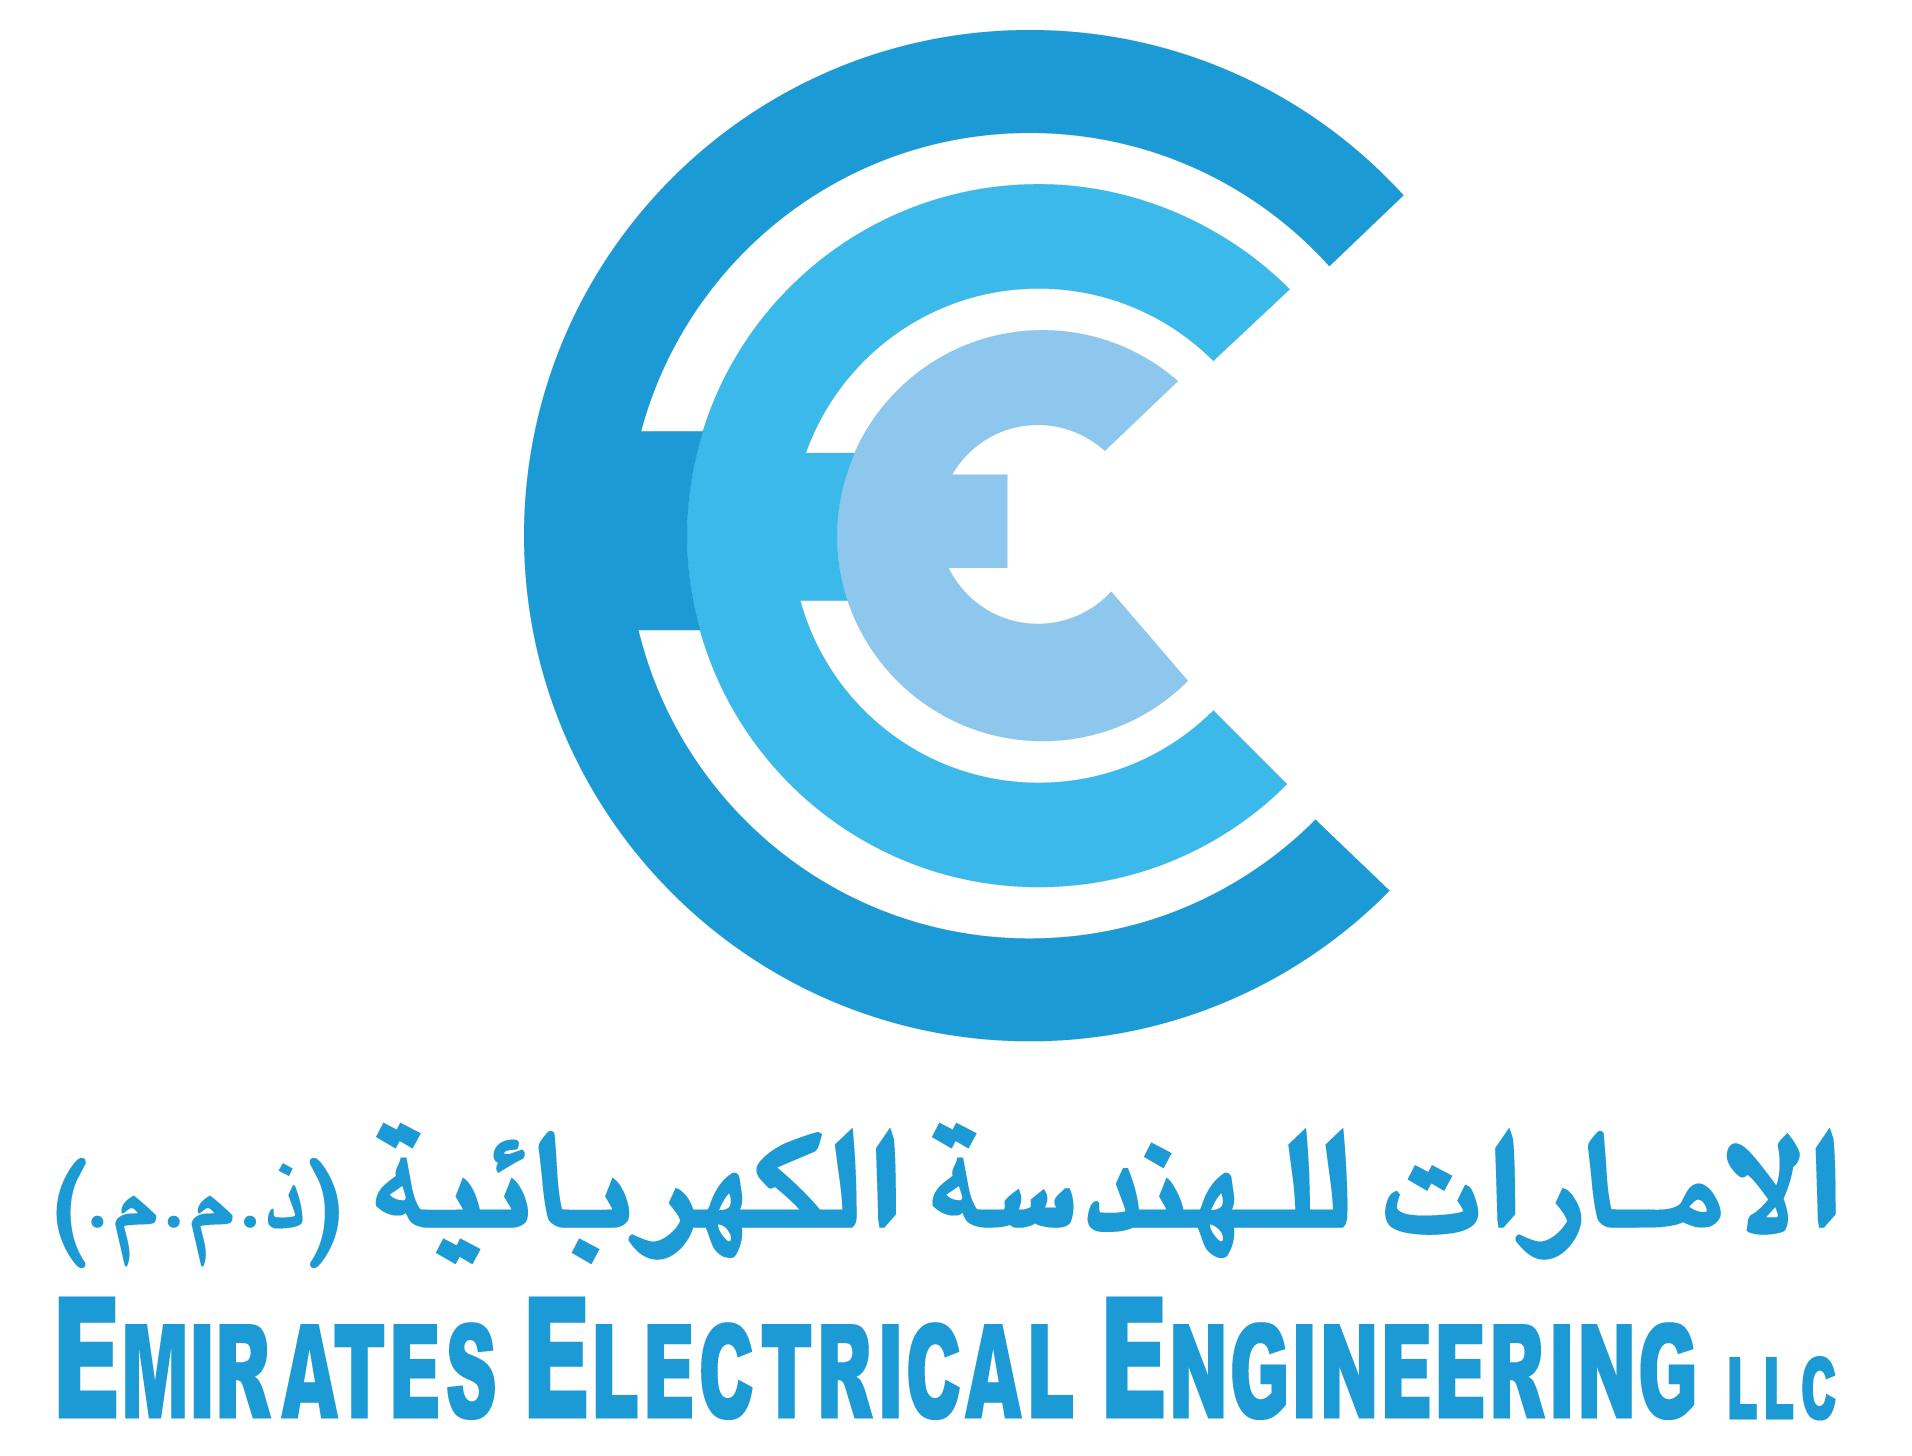 Emirates Electrical Engineering